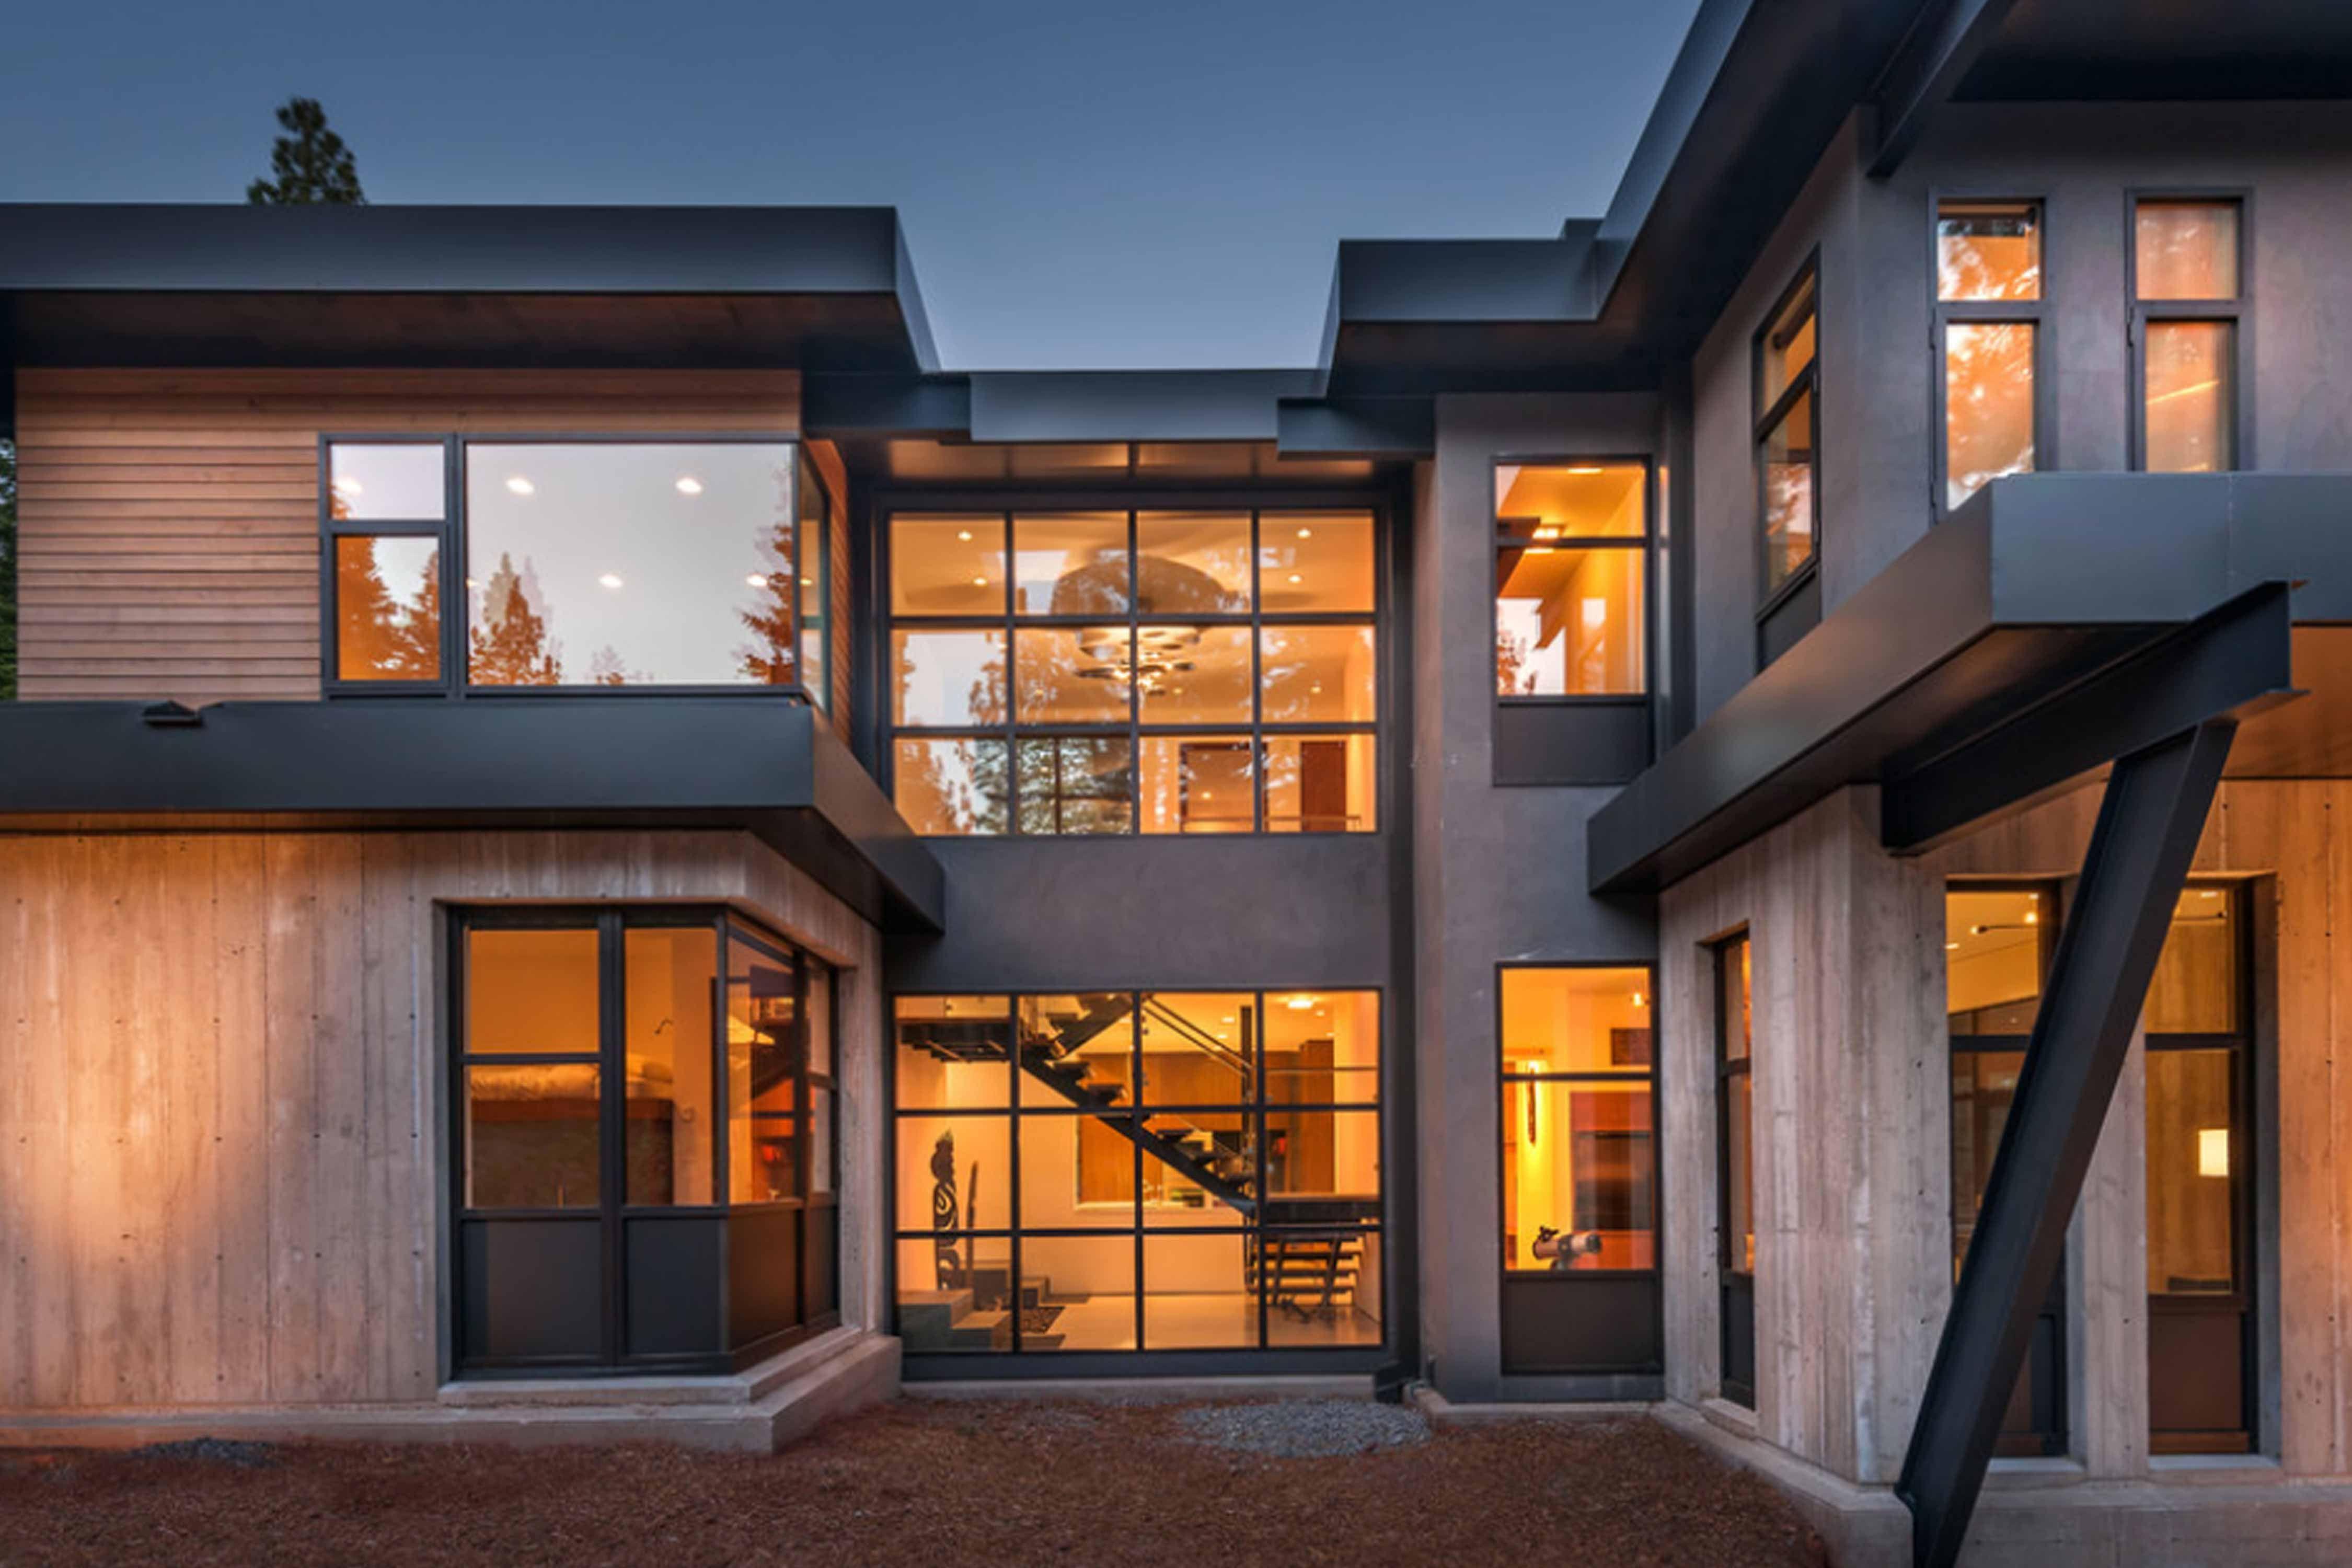 Best Kitchen Gallery: Interior Design Home Decor Windows Architecture Houses Homes of Modern Home Windows  on rachelxblog.com